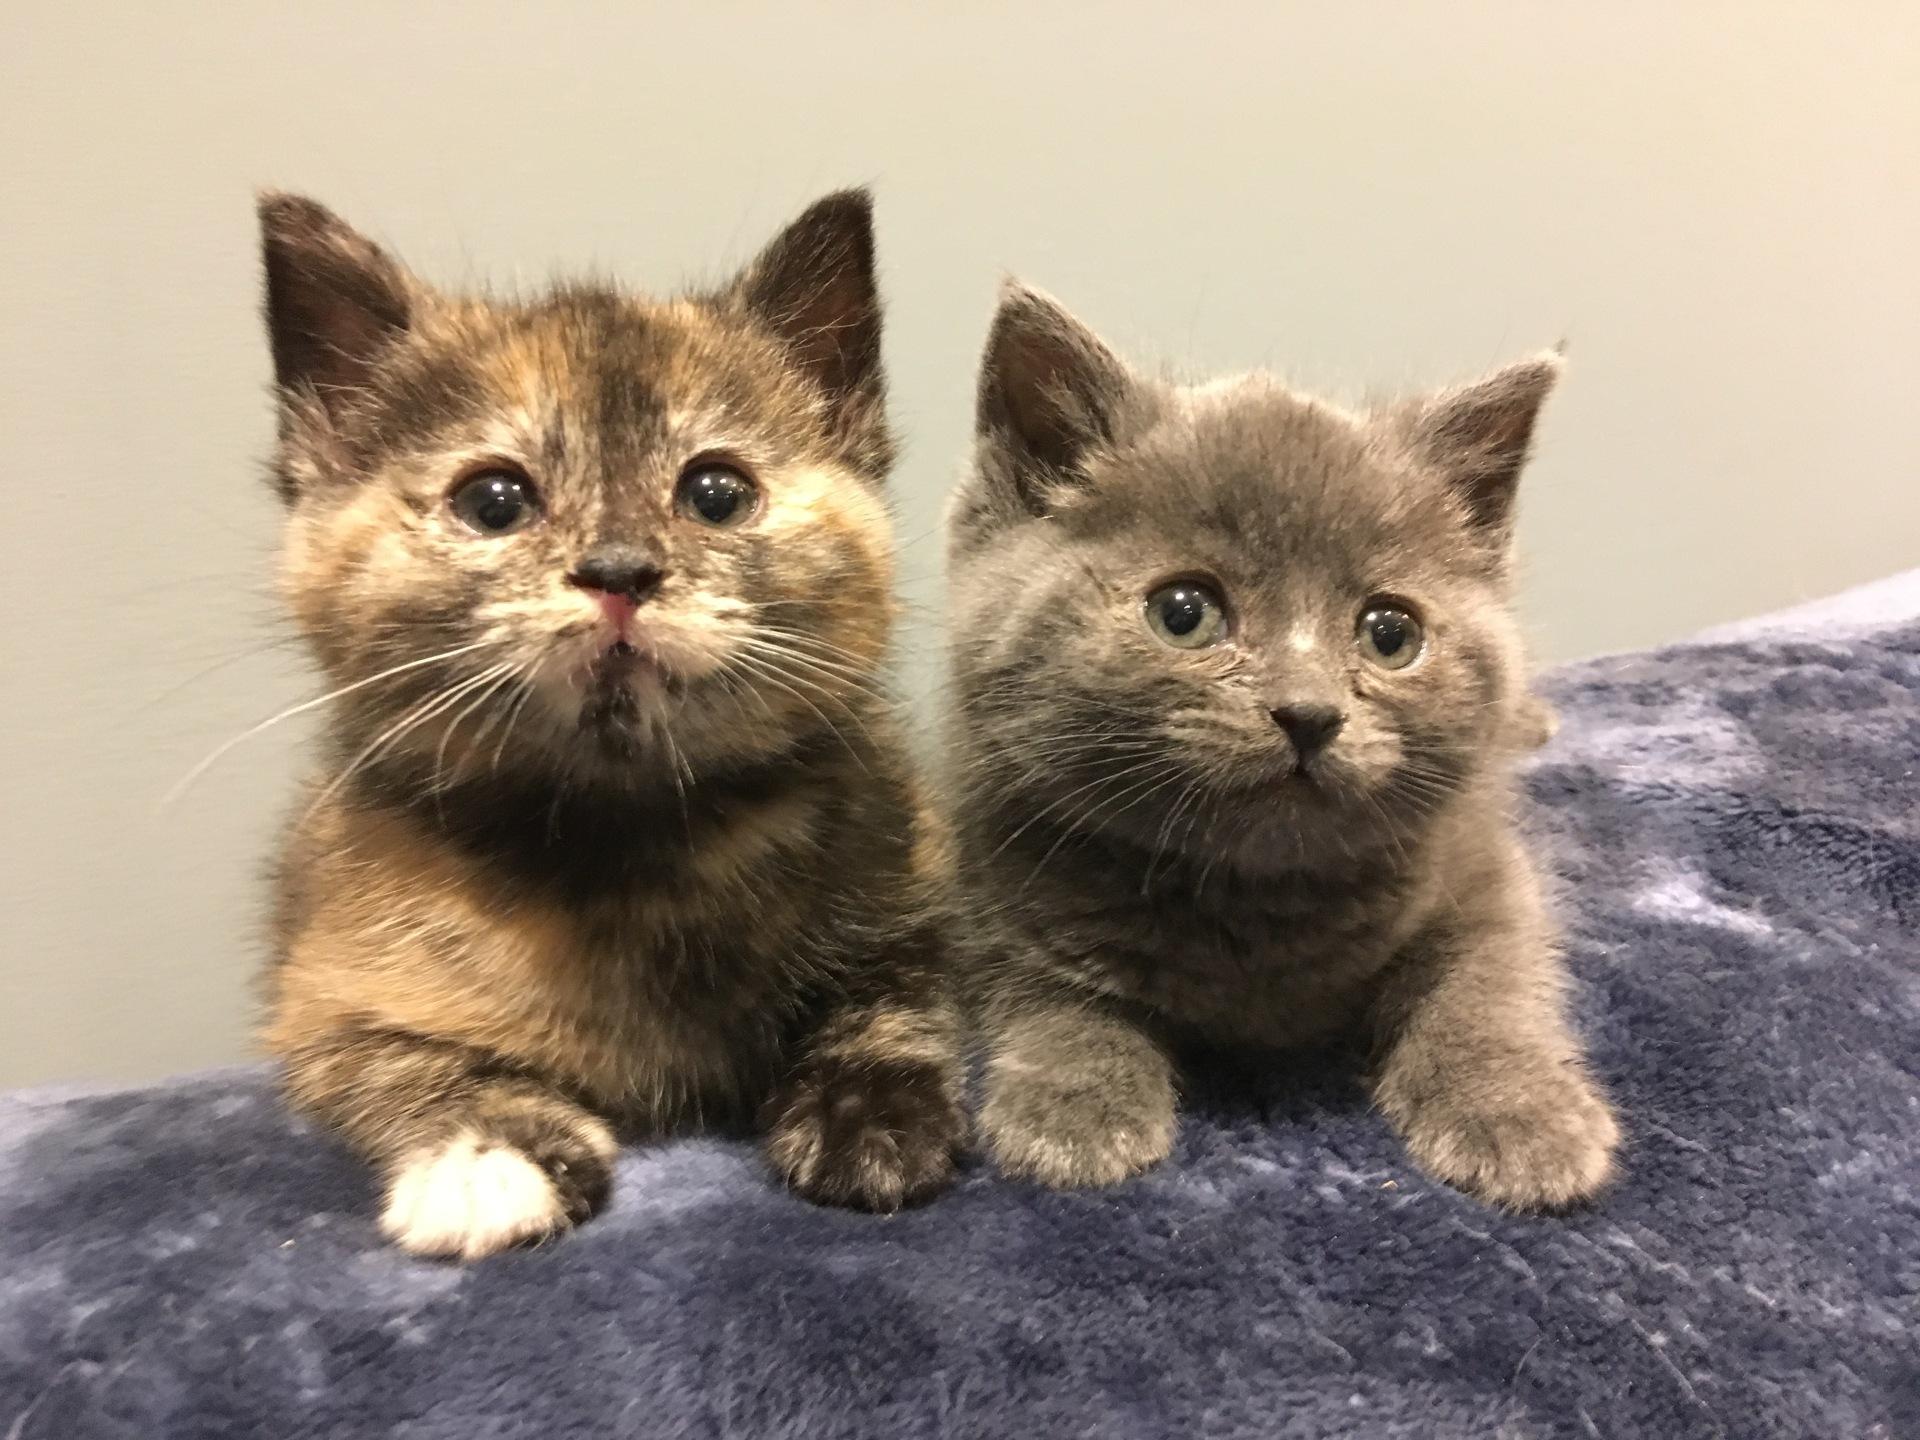 Foster kittens: Shrimp & Scallop